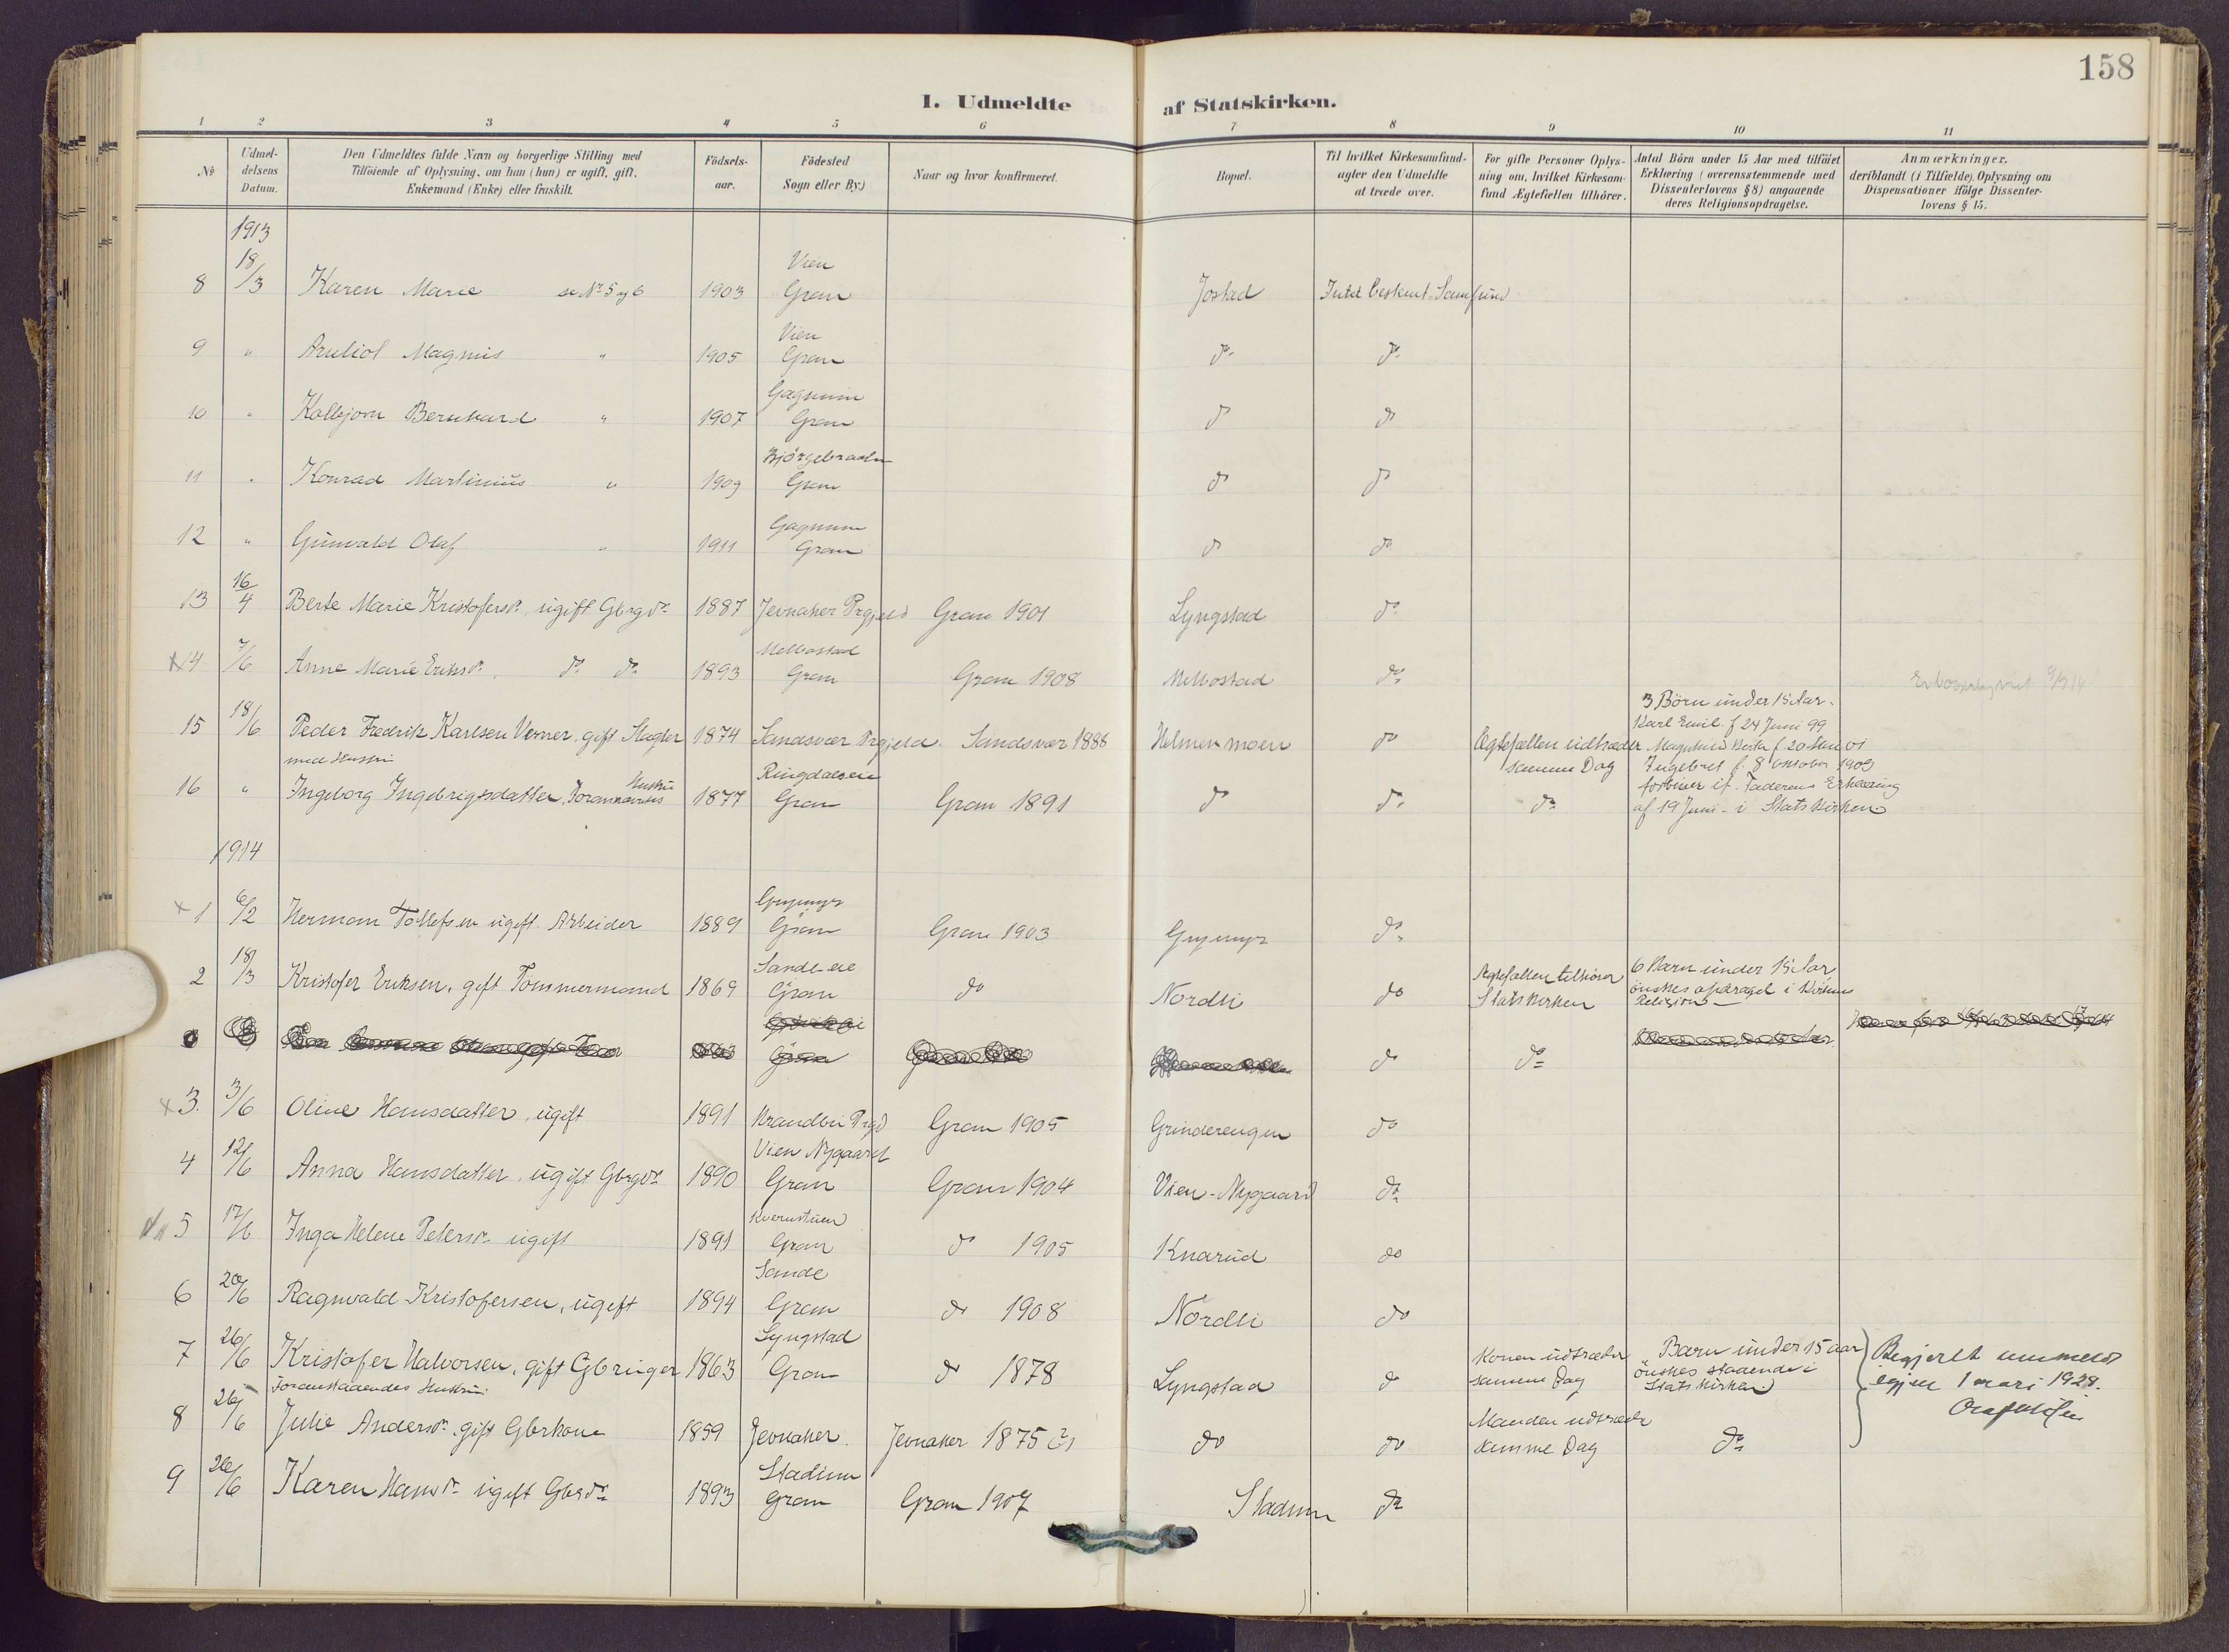 SAH, Gran prestekontor, Ministerialbok nr. 22, 1908-1918, s. 158